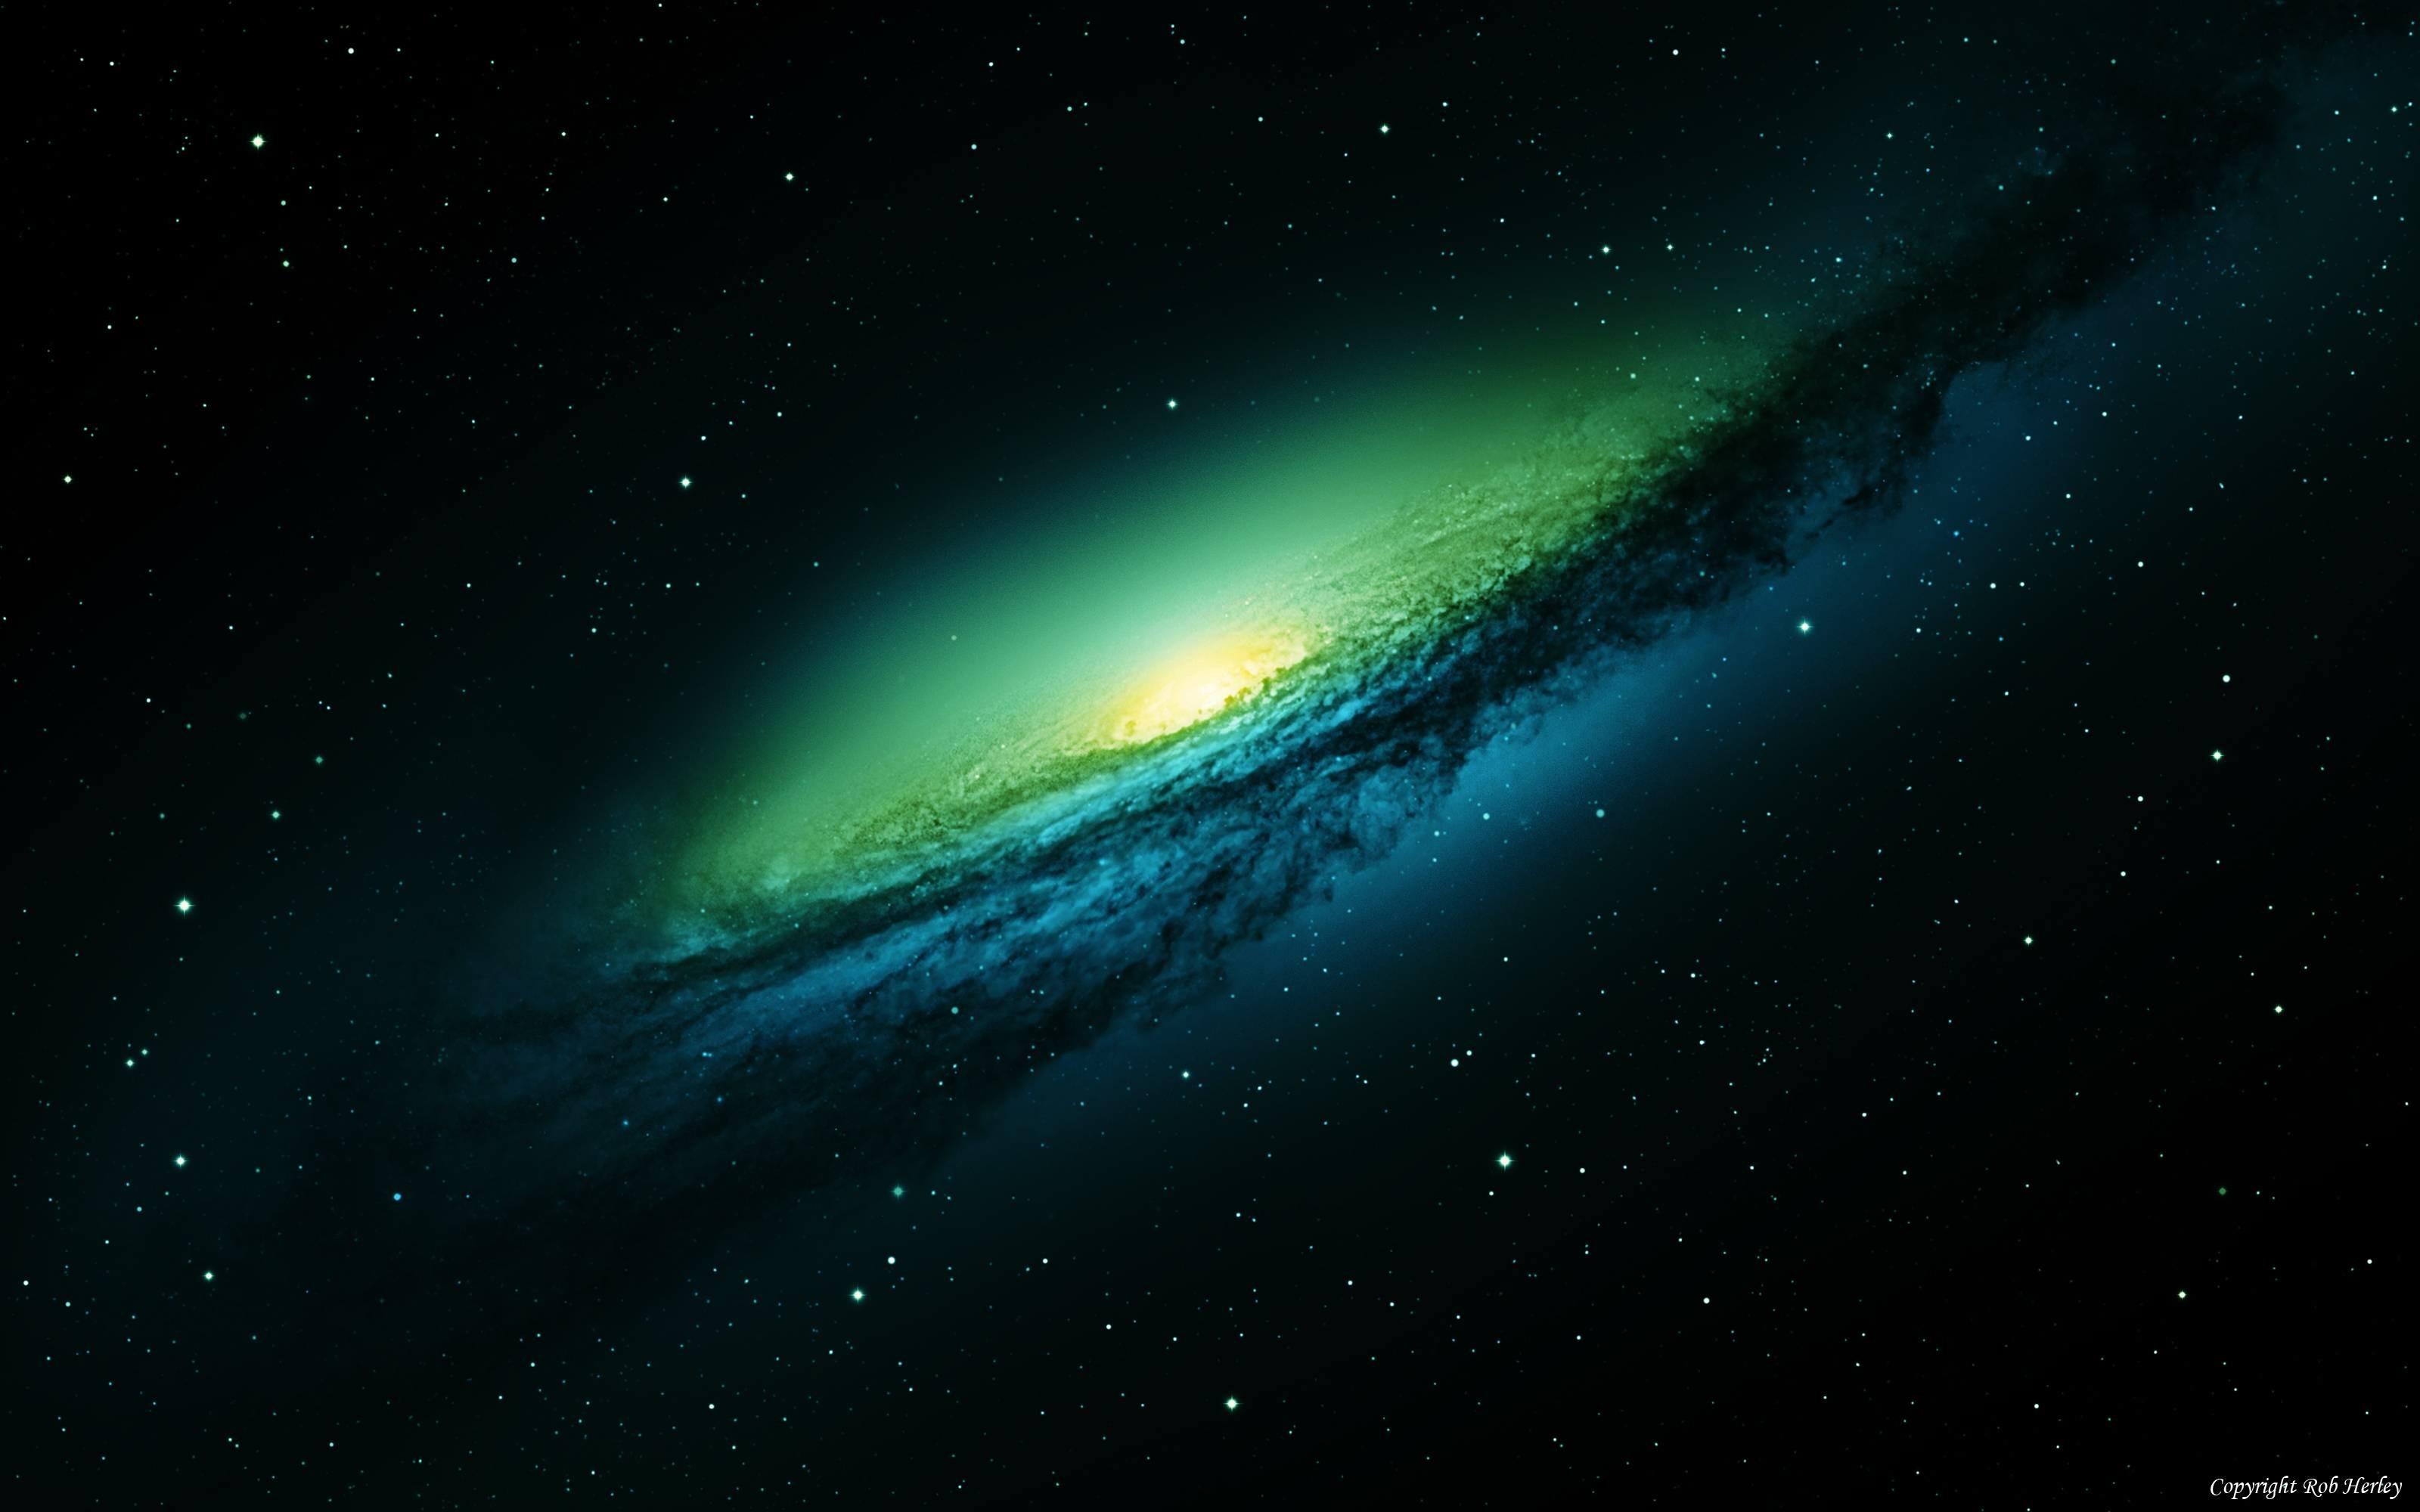 Milky Way Galaxy Wallpaper Top My Wallpapers 1